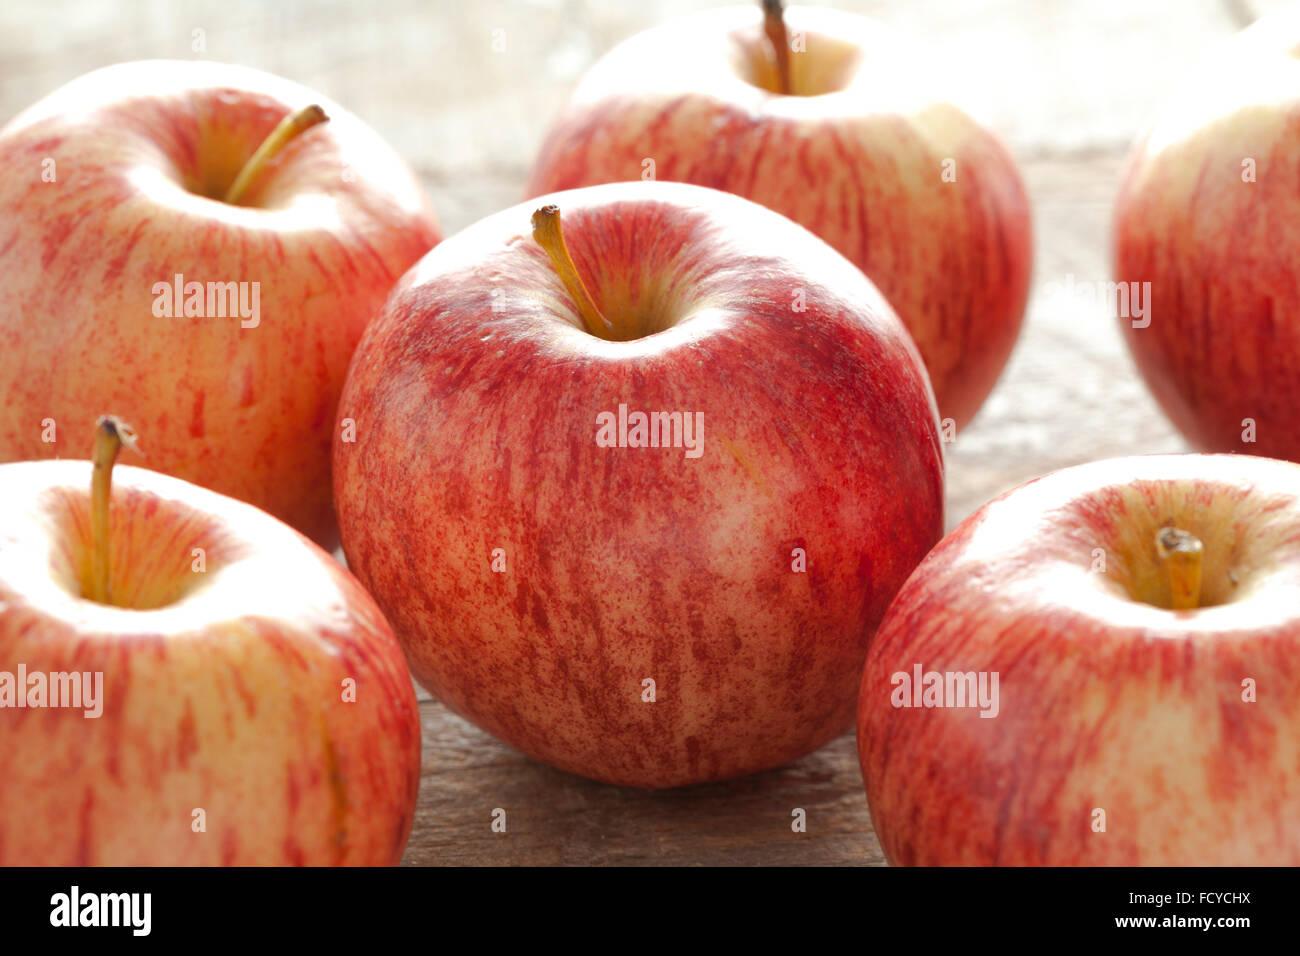 Fresh Royal Gala apples - Stock Image